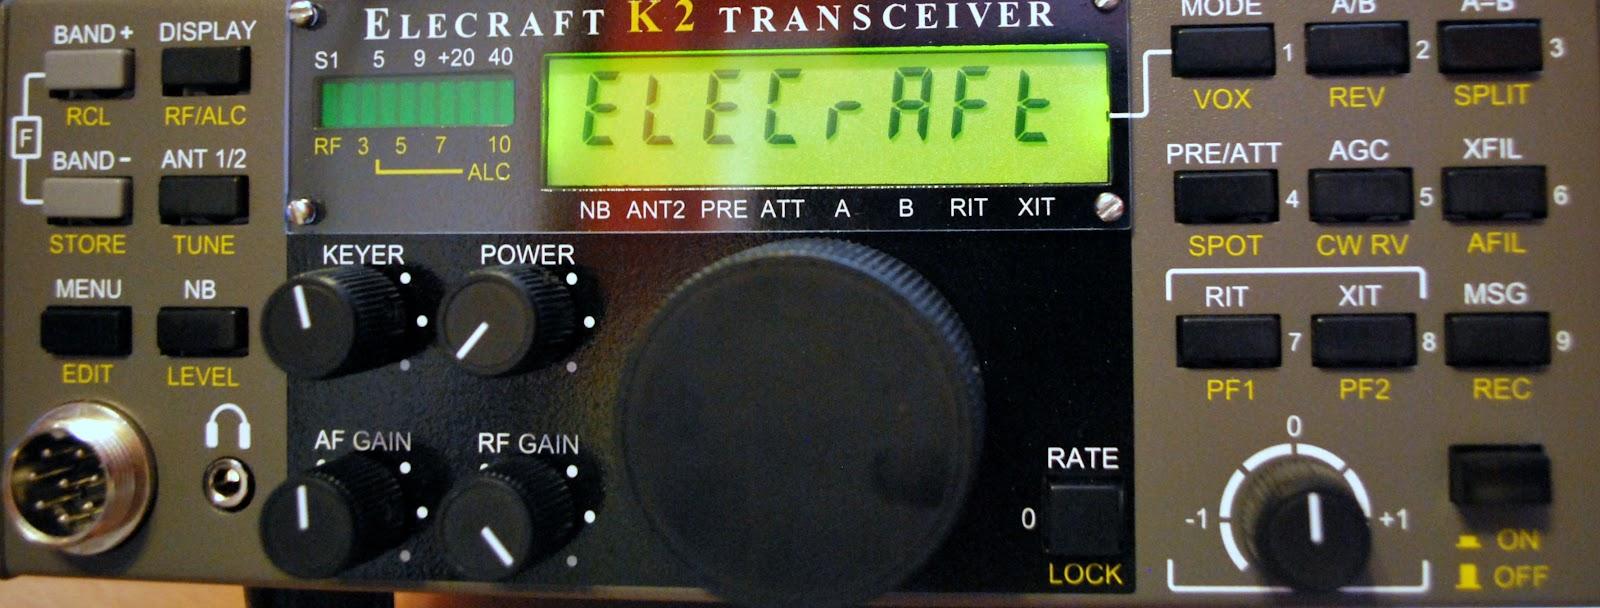 Elecraft K2 Archives • AmateurRadio com